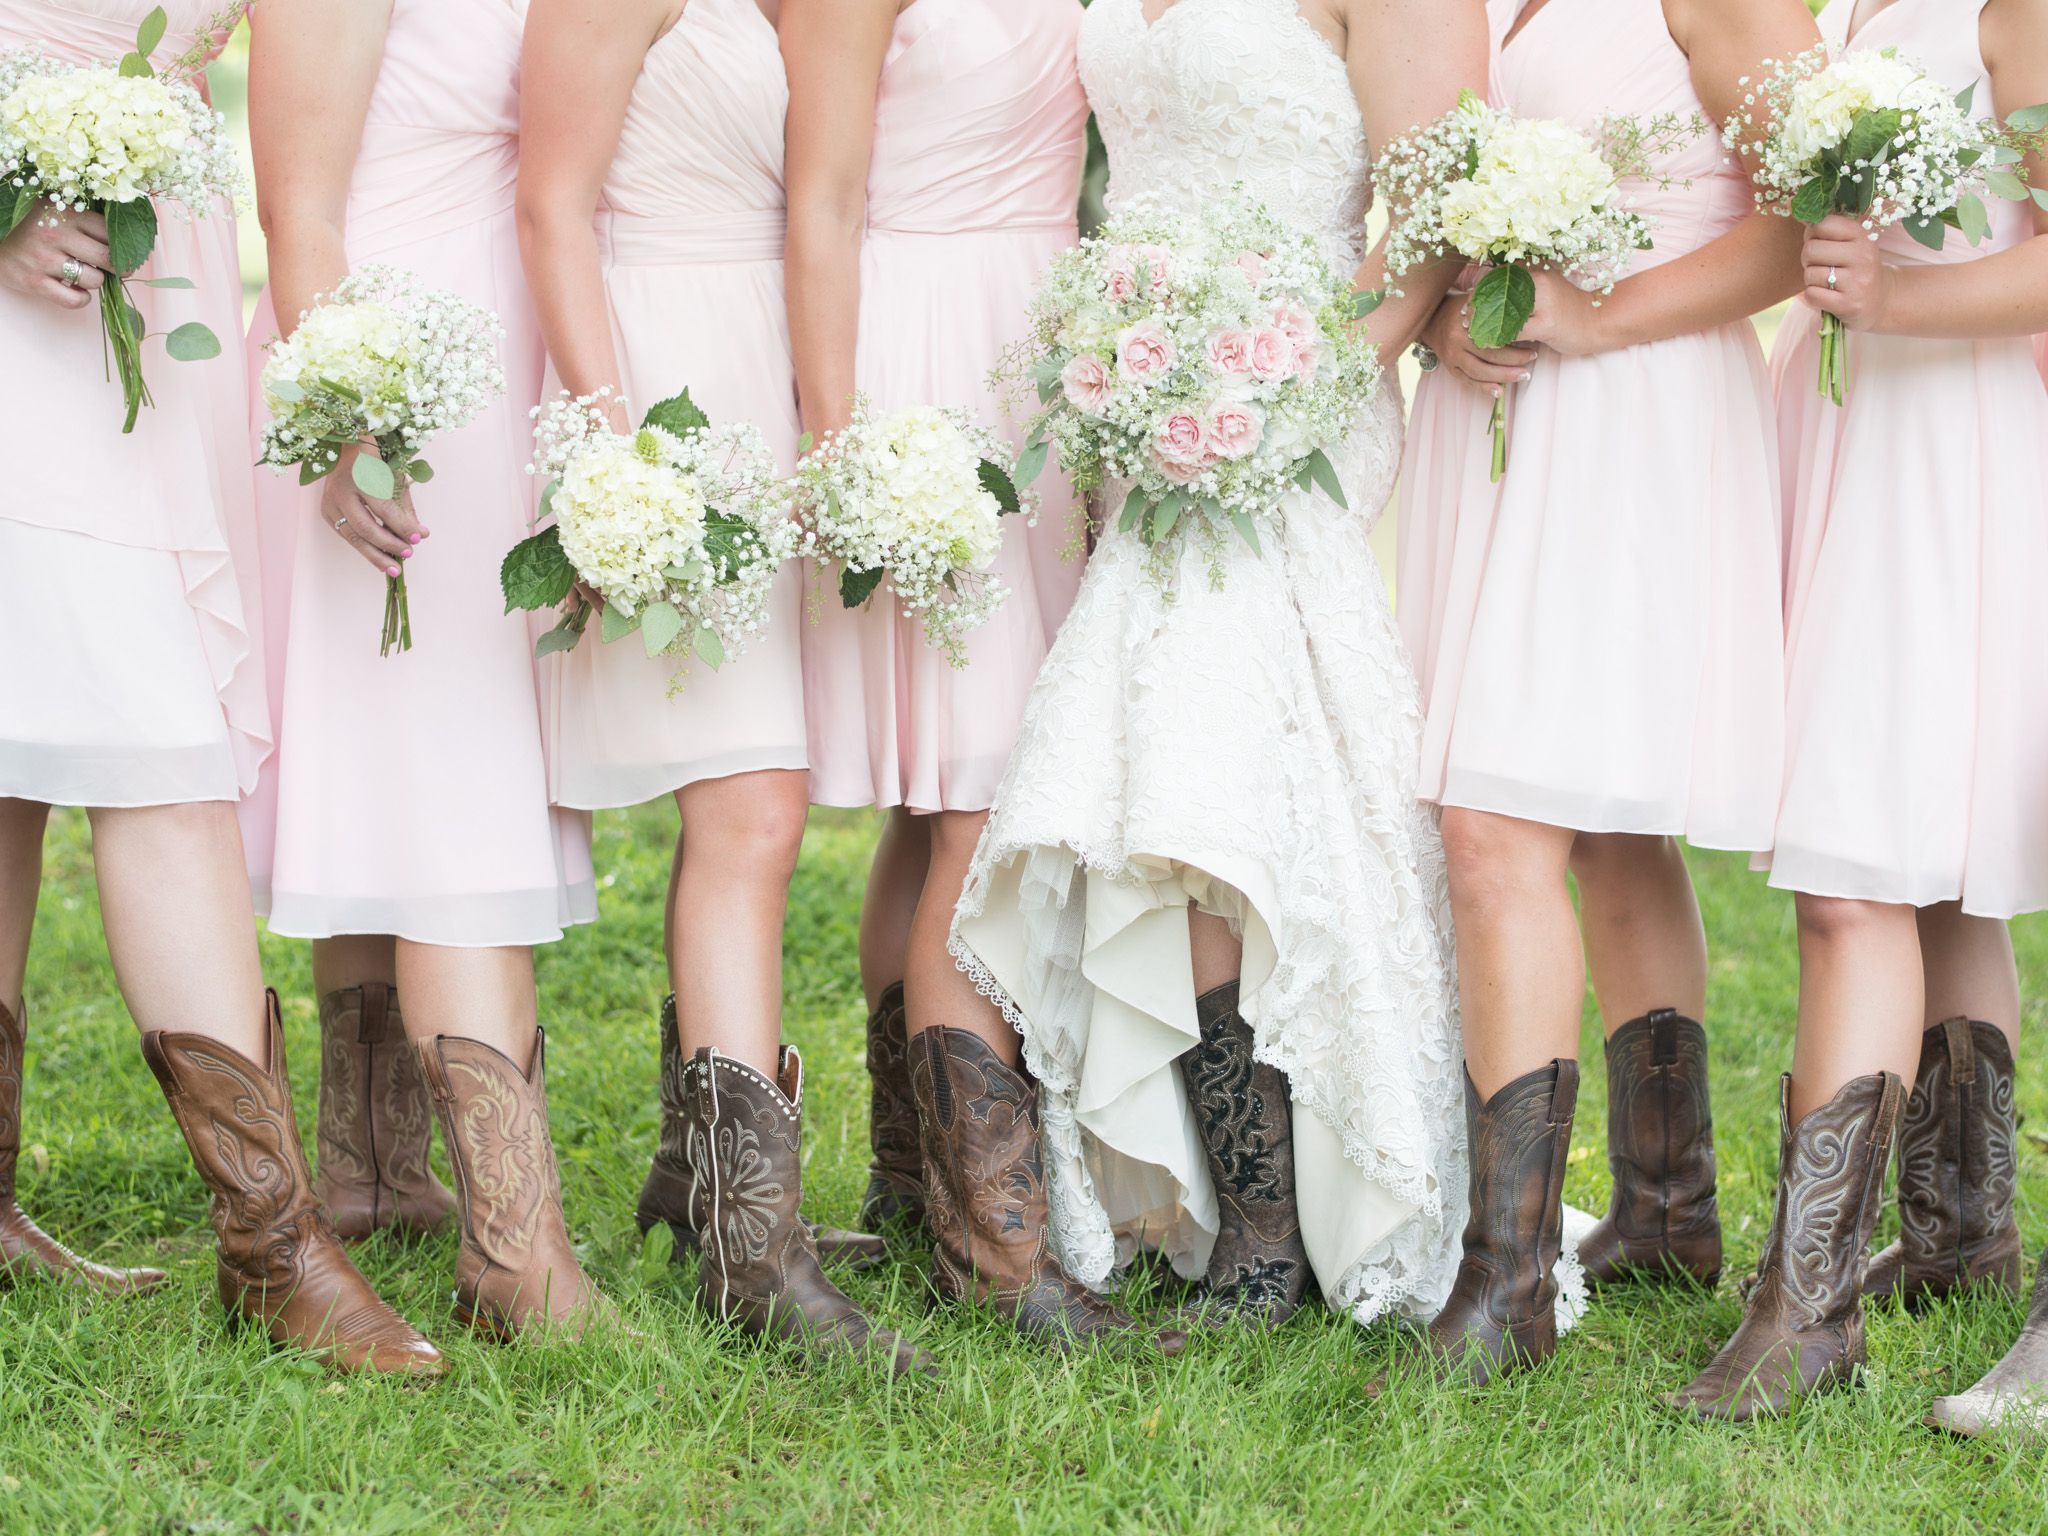 Country and Rustic Wedding Ideas | GAC | Wedding Shoe Photos ...